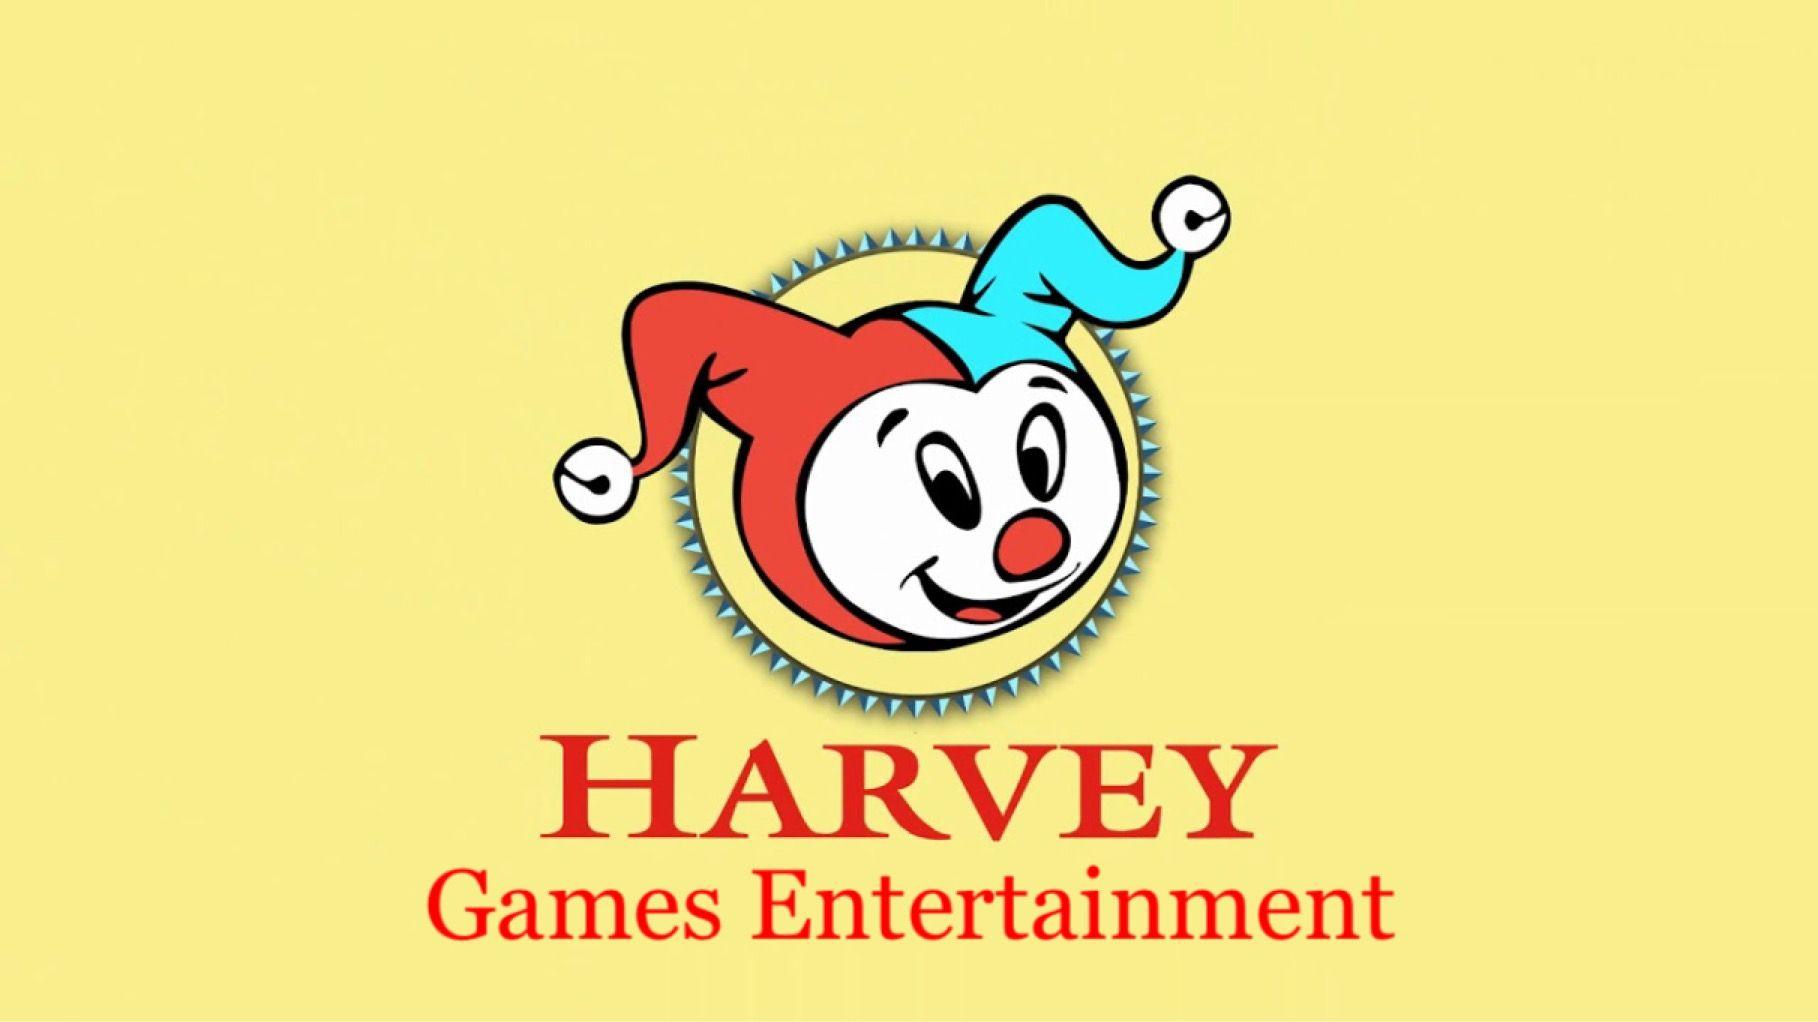 #videogame #videogames #videogamer #gamestudio #gamestudios #game #games #gaming #gamer